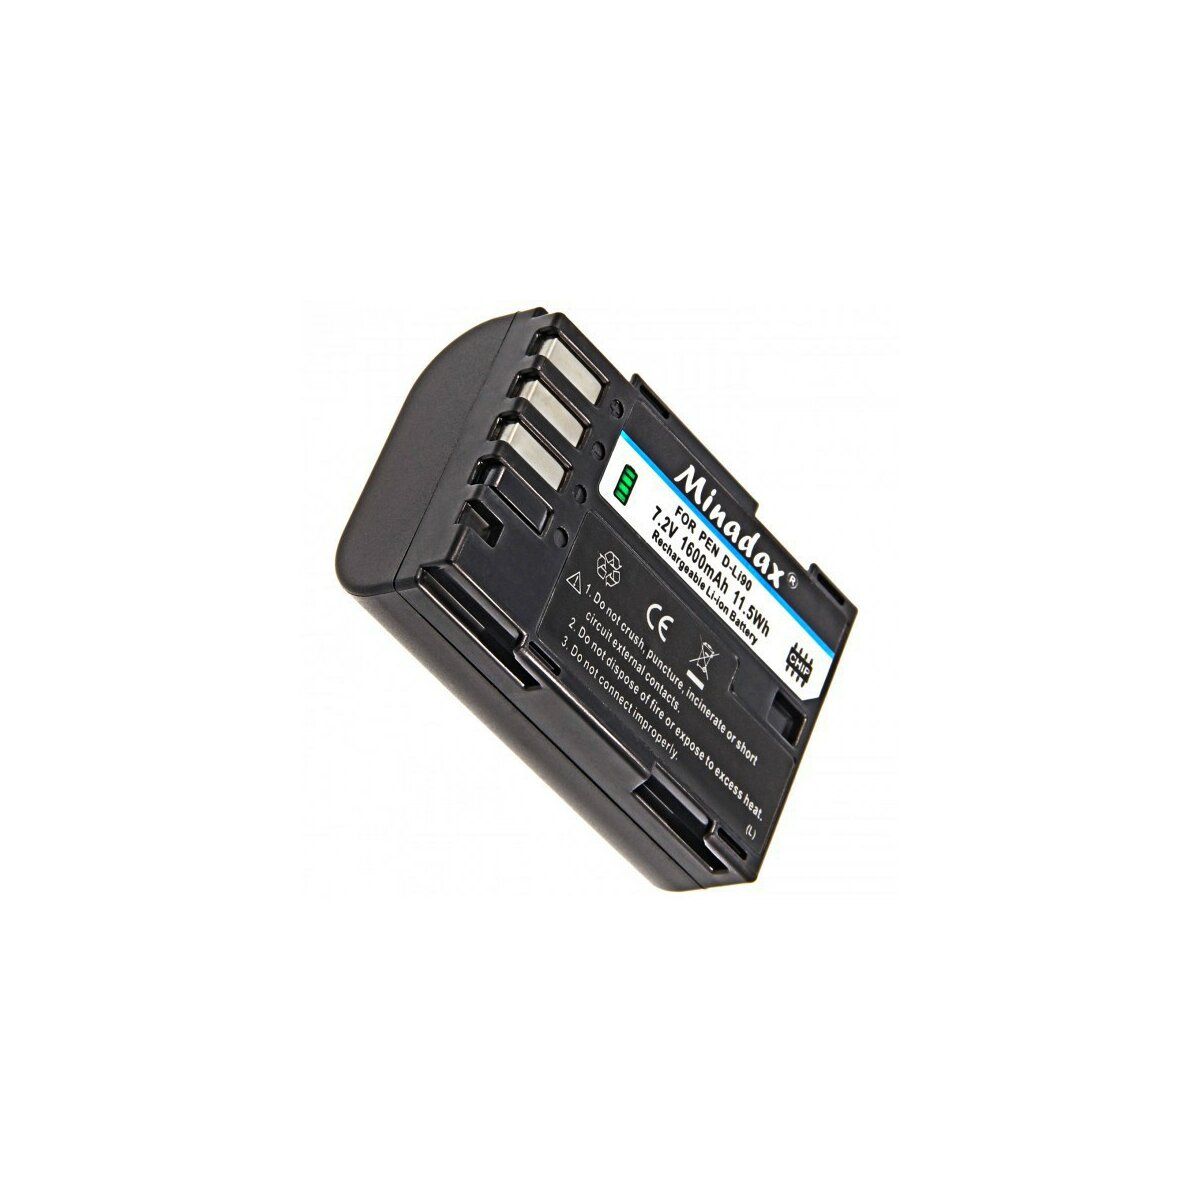 "Minadax PRO Li-Ion Akku ""Hohe Kapazität"" 1600 mAh kompatibel mit Pentax K-3, K-5 und K-7 - Ersatz für D-Li90"